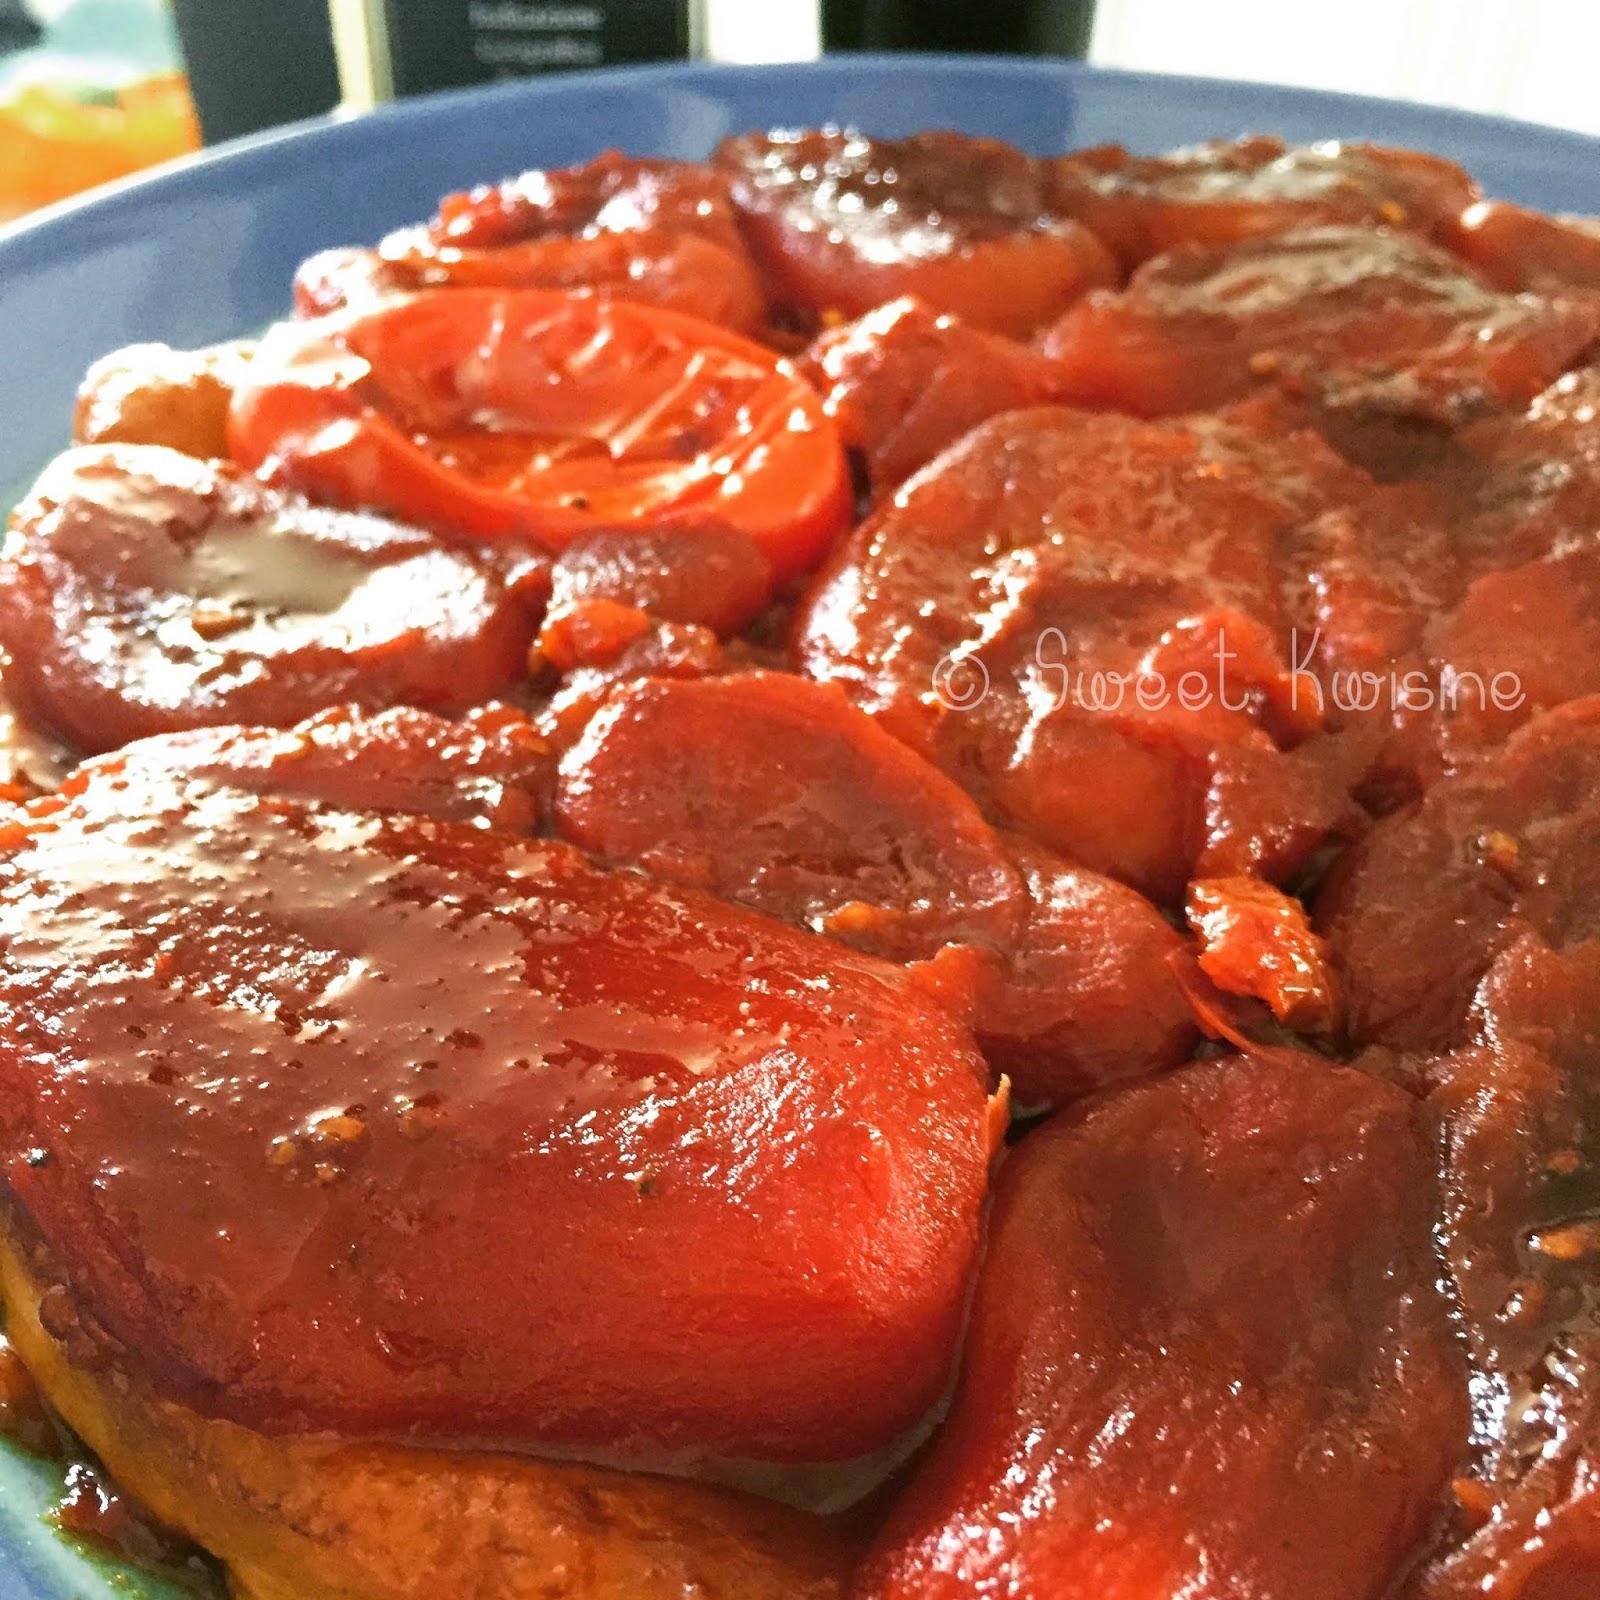 sweet kwisine, tarte, tatin, tomate, tomato, martinique, tomate séchées, thym, végétarien, cuisine végétarienne